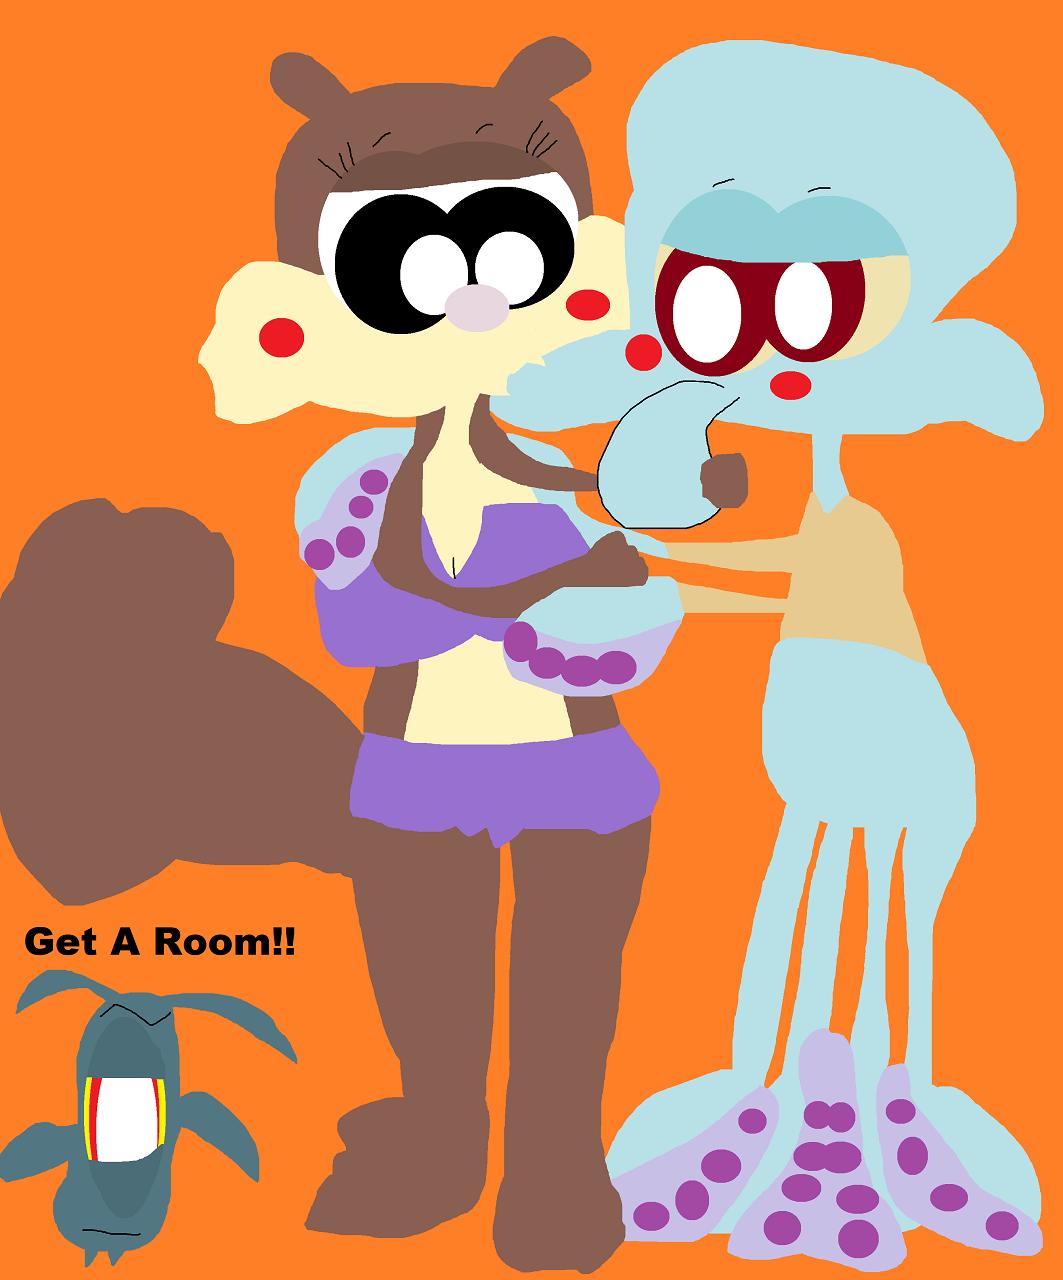 Just A Random Get A Room by Falconlobo